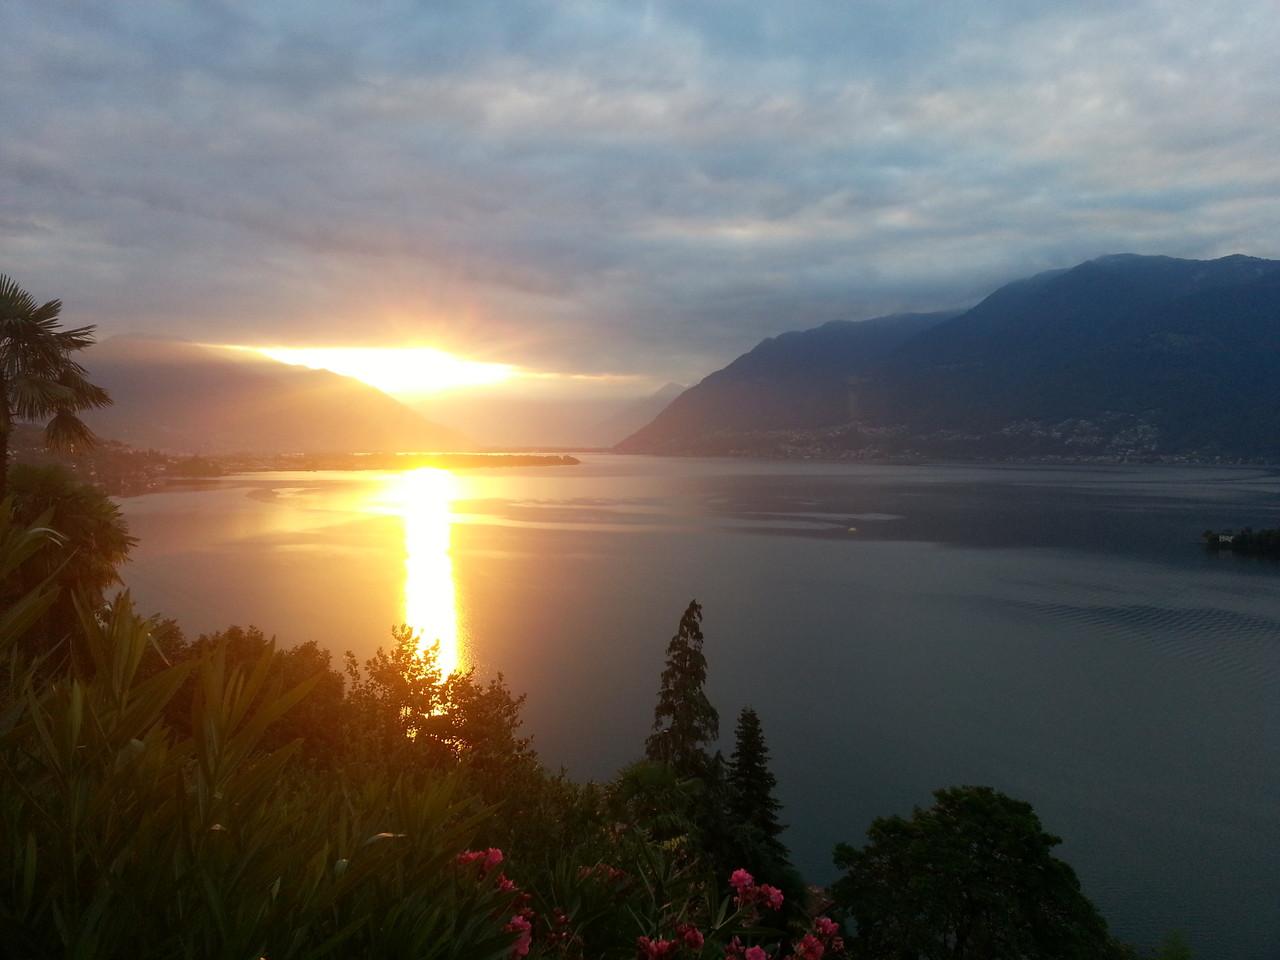 Sonnenaufgang über den Alpen